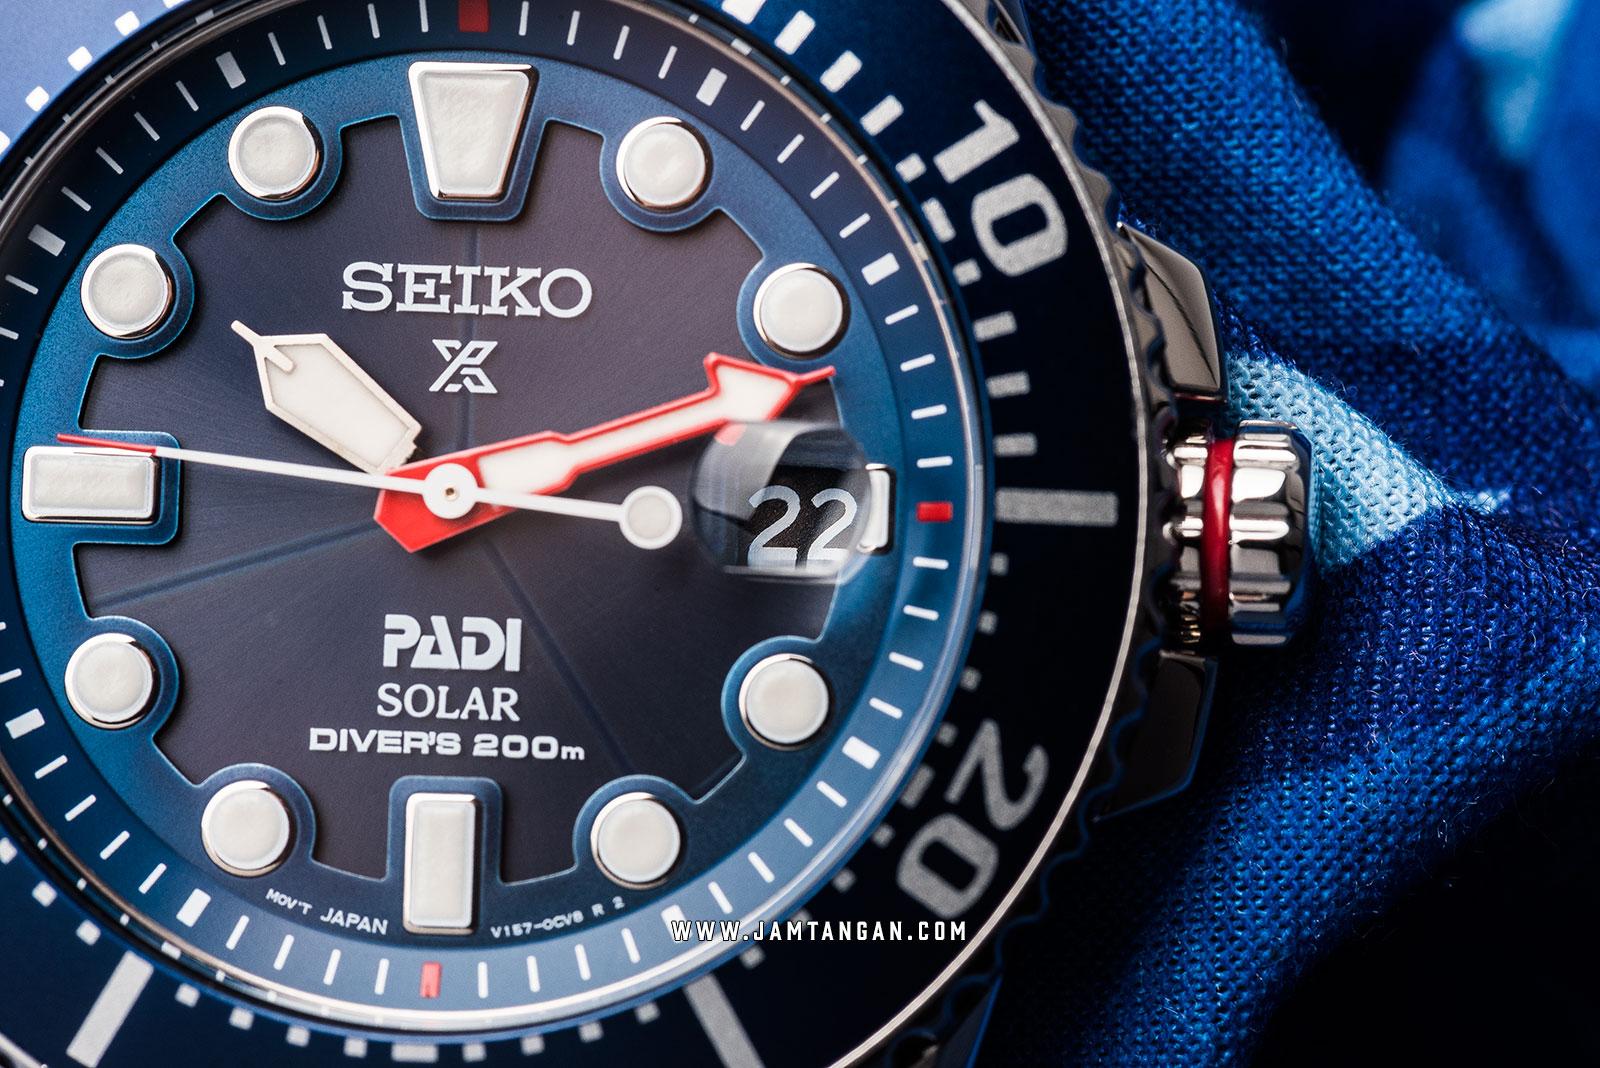 Seiko Prospex SNE435P1 PADI Solar Divers 200M Blue Dial Special Edition Machtwatch